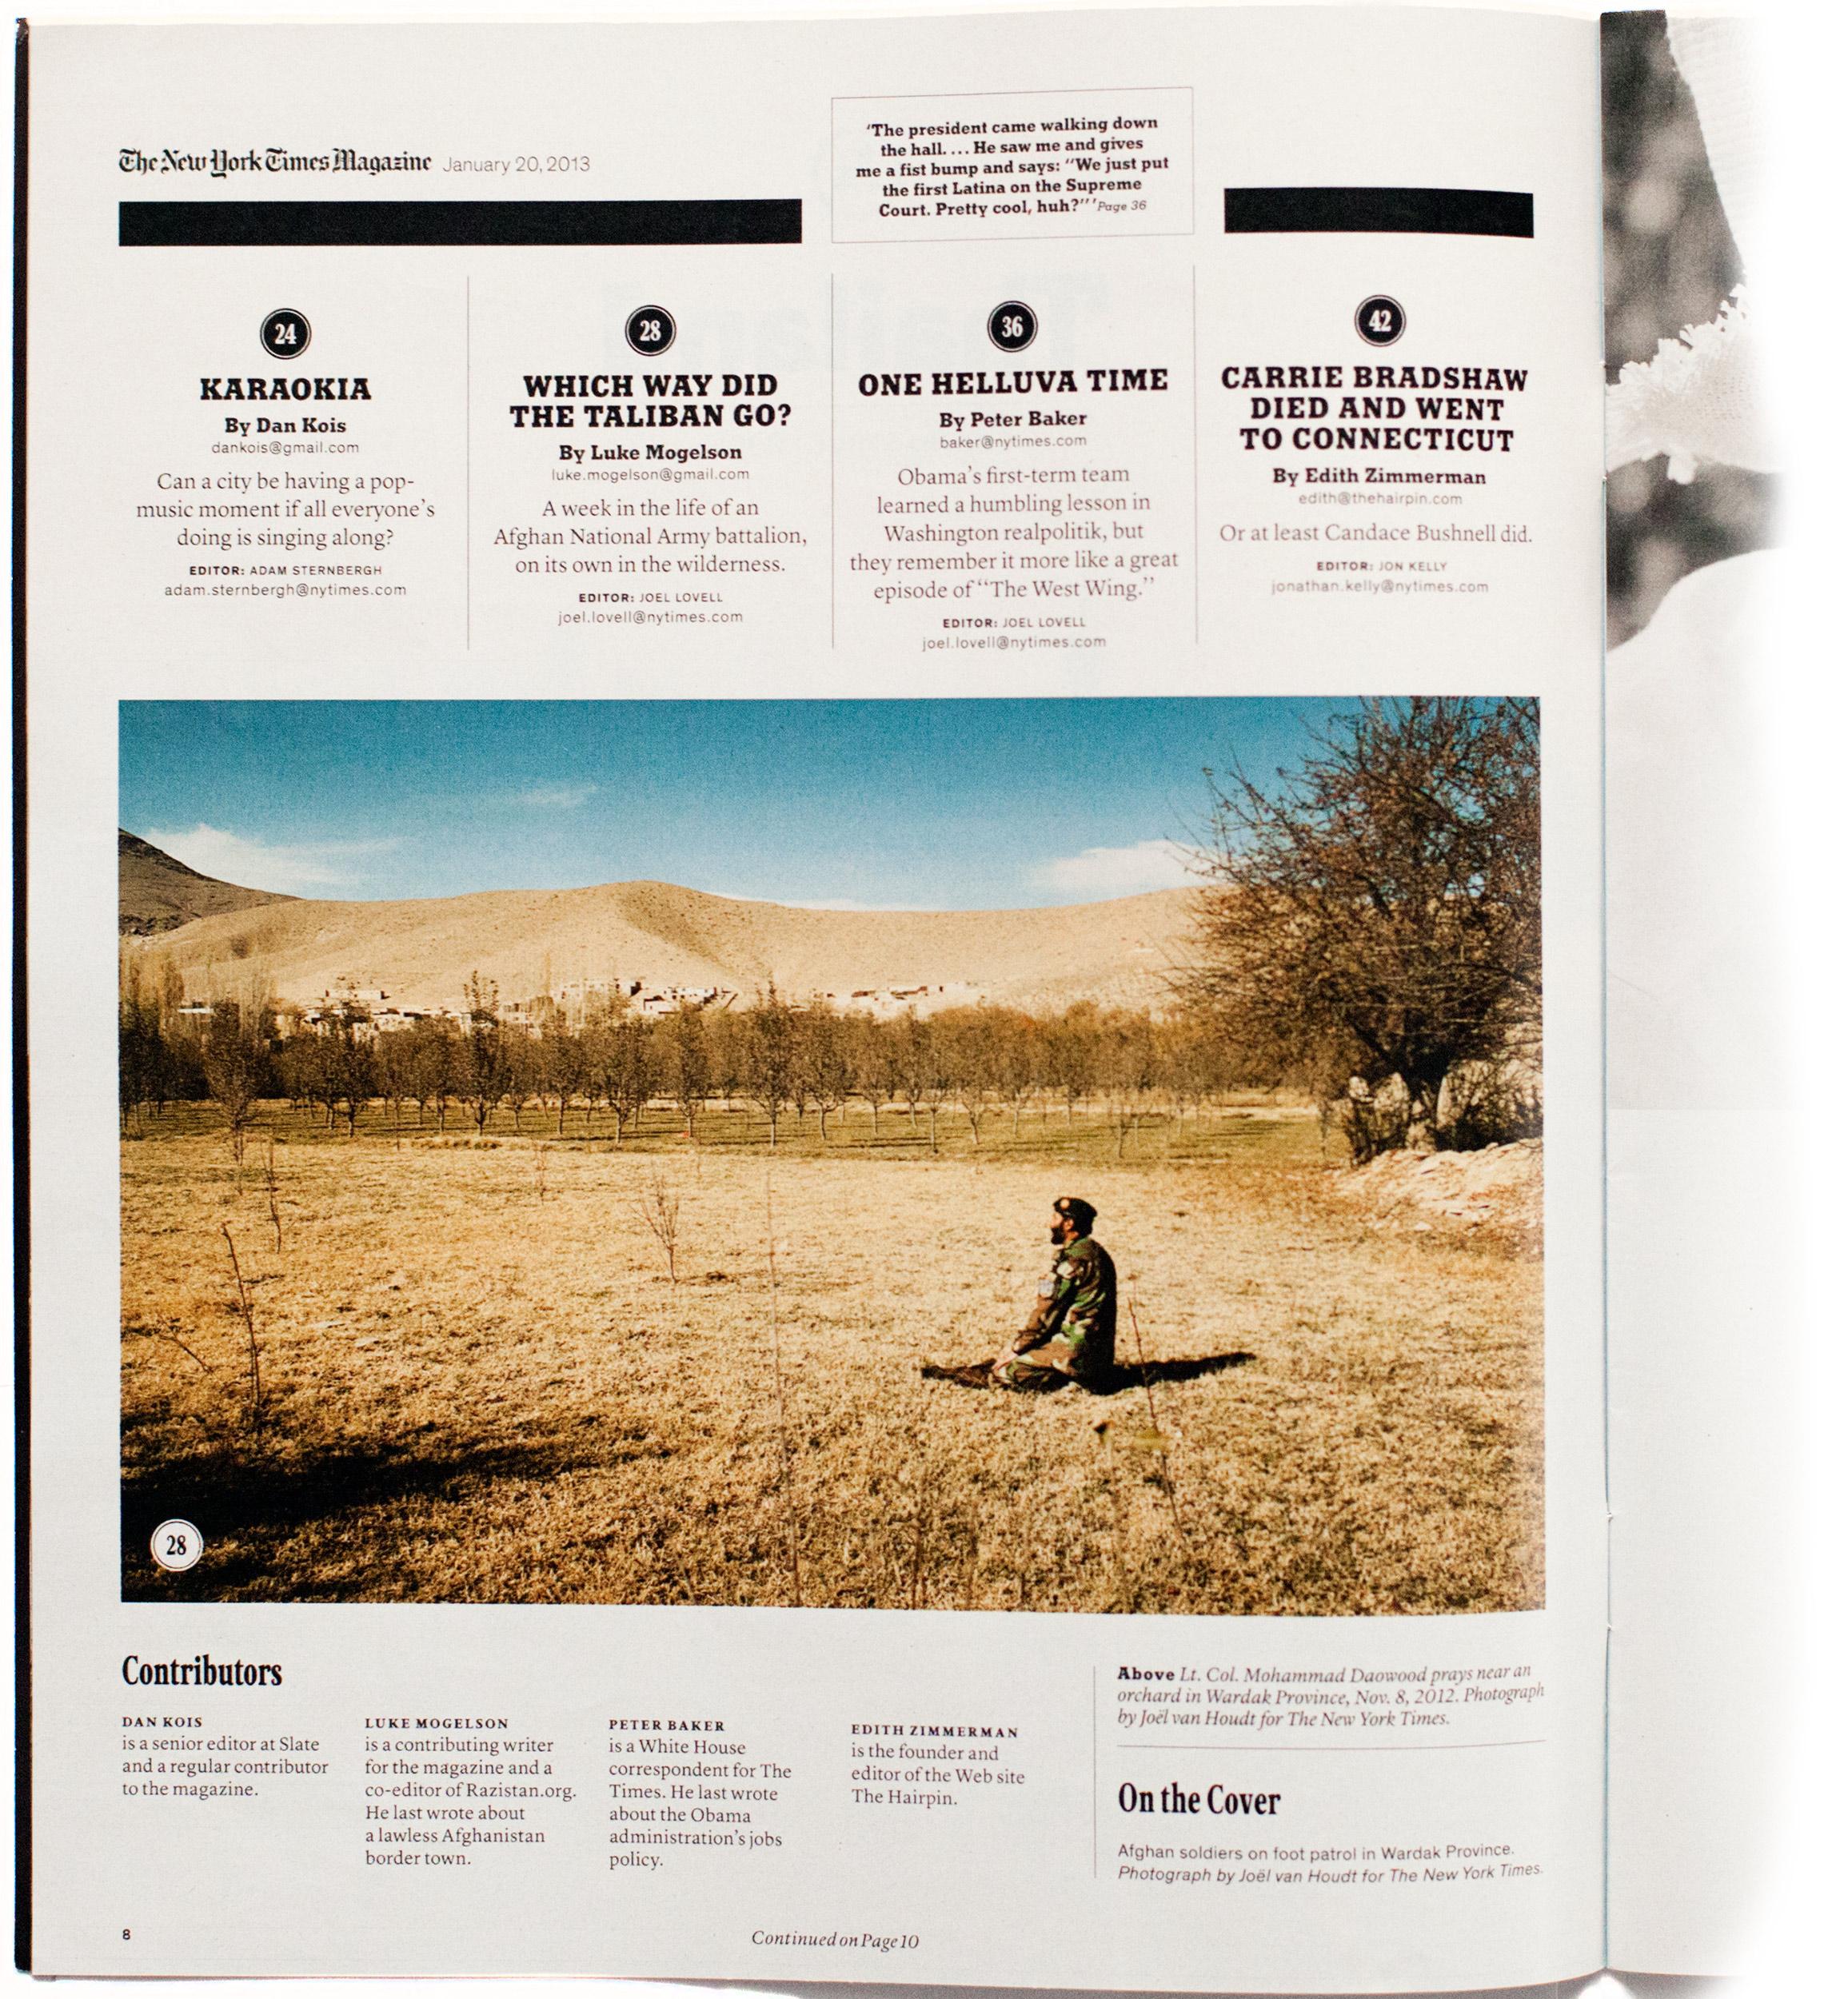 The New York Times Magazine Joel Van Houdt